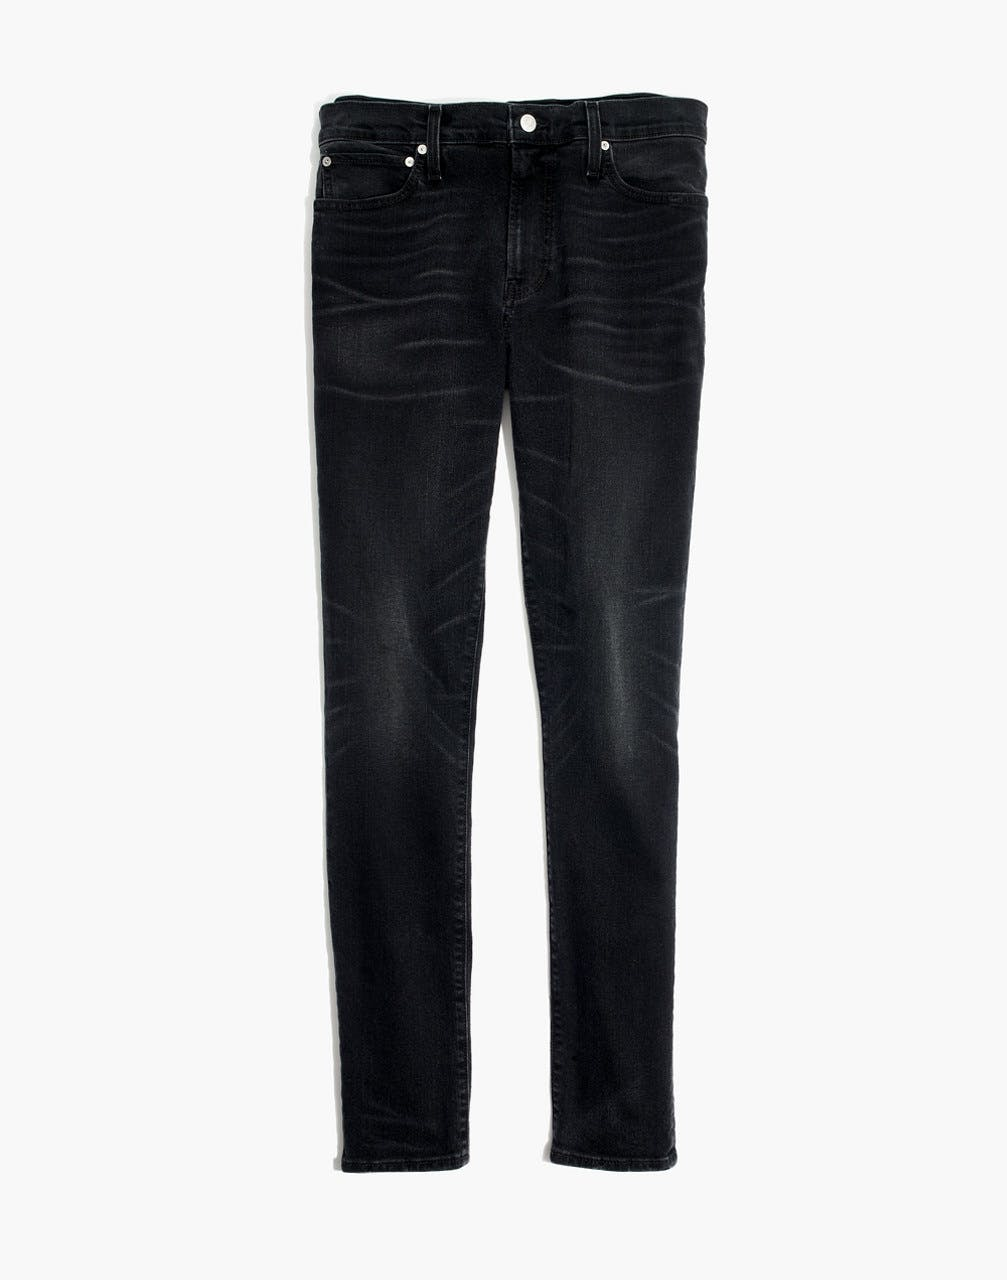 madewell, madewell jeans, madewell denim, jeans, denim, skinny jeans, denimblog, denim blog, jeansblog, jeans blog, skinny jeans, skinny denim, slim jeans, skinny straight jeans, faded black denim, faded black jeans, washed black jeans, washed black denim